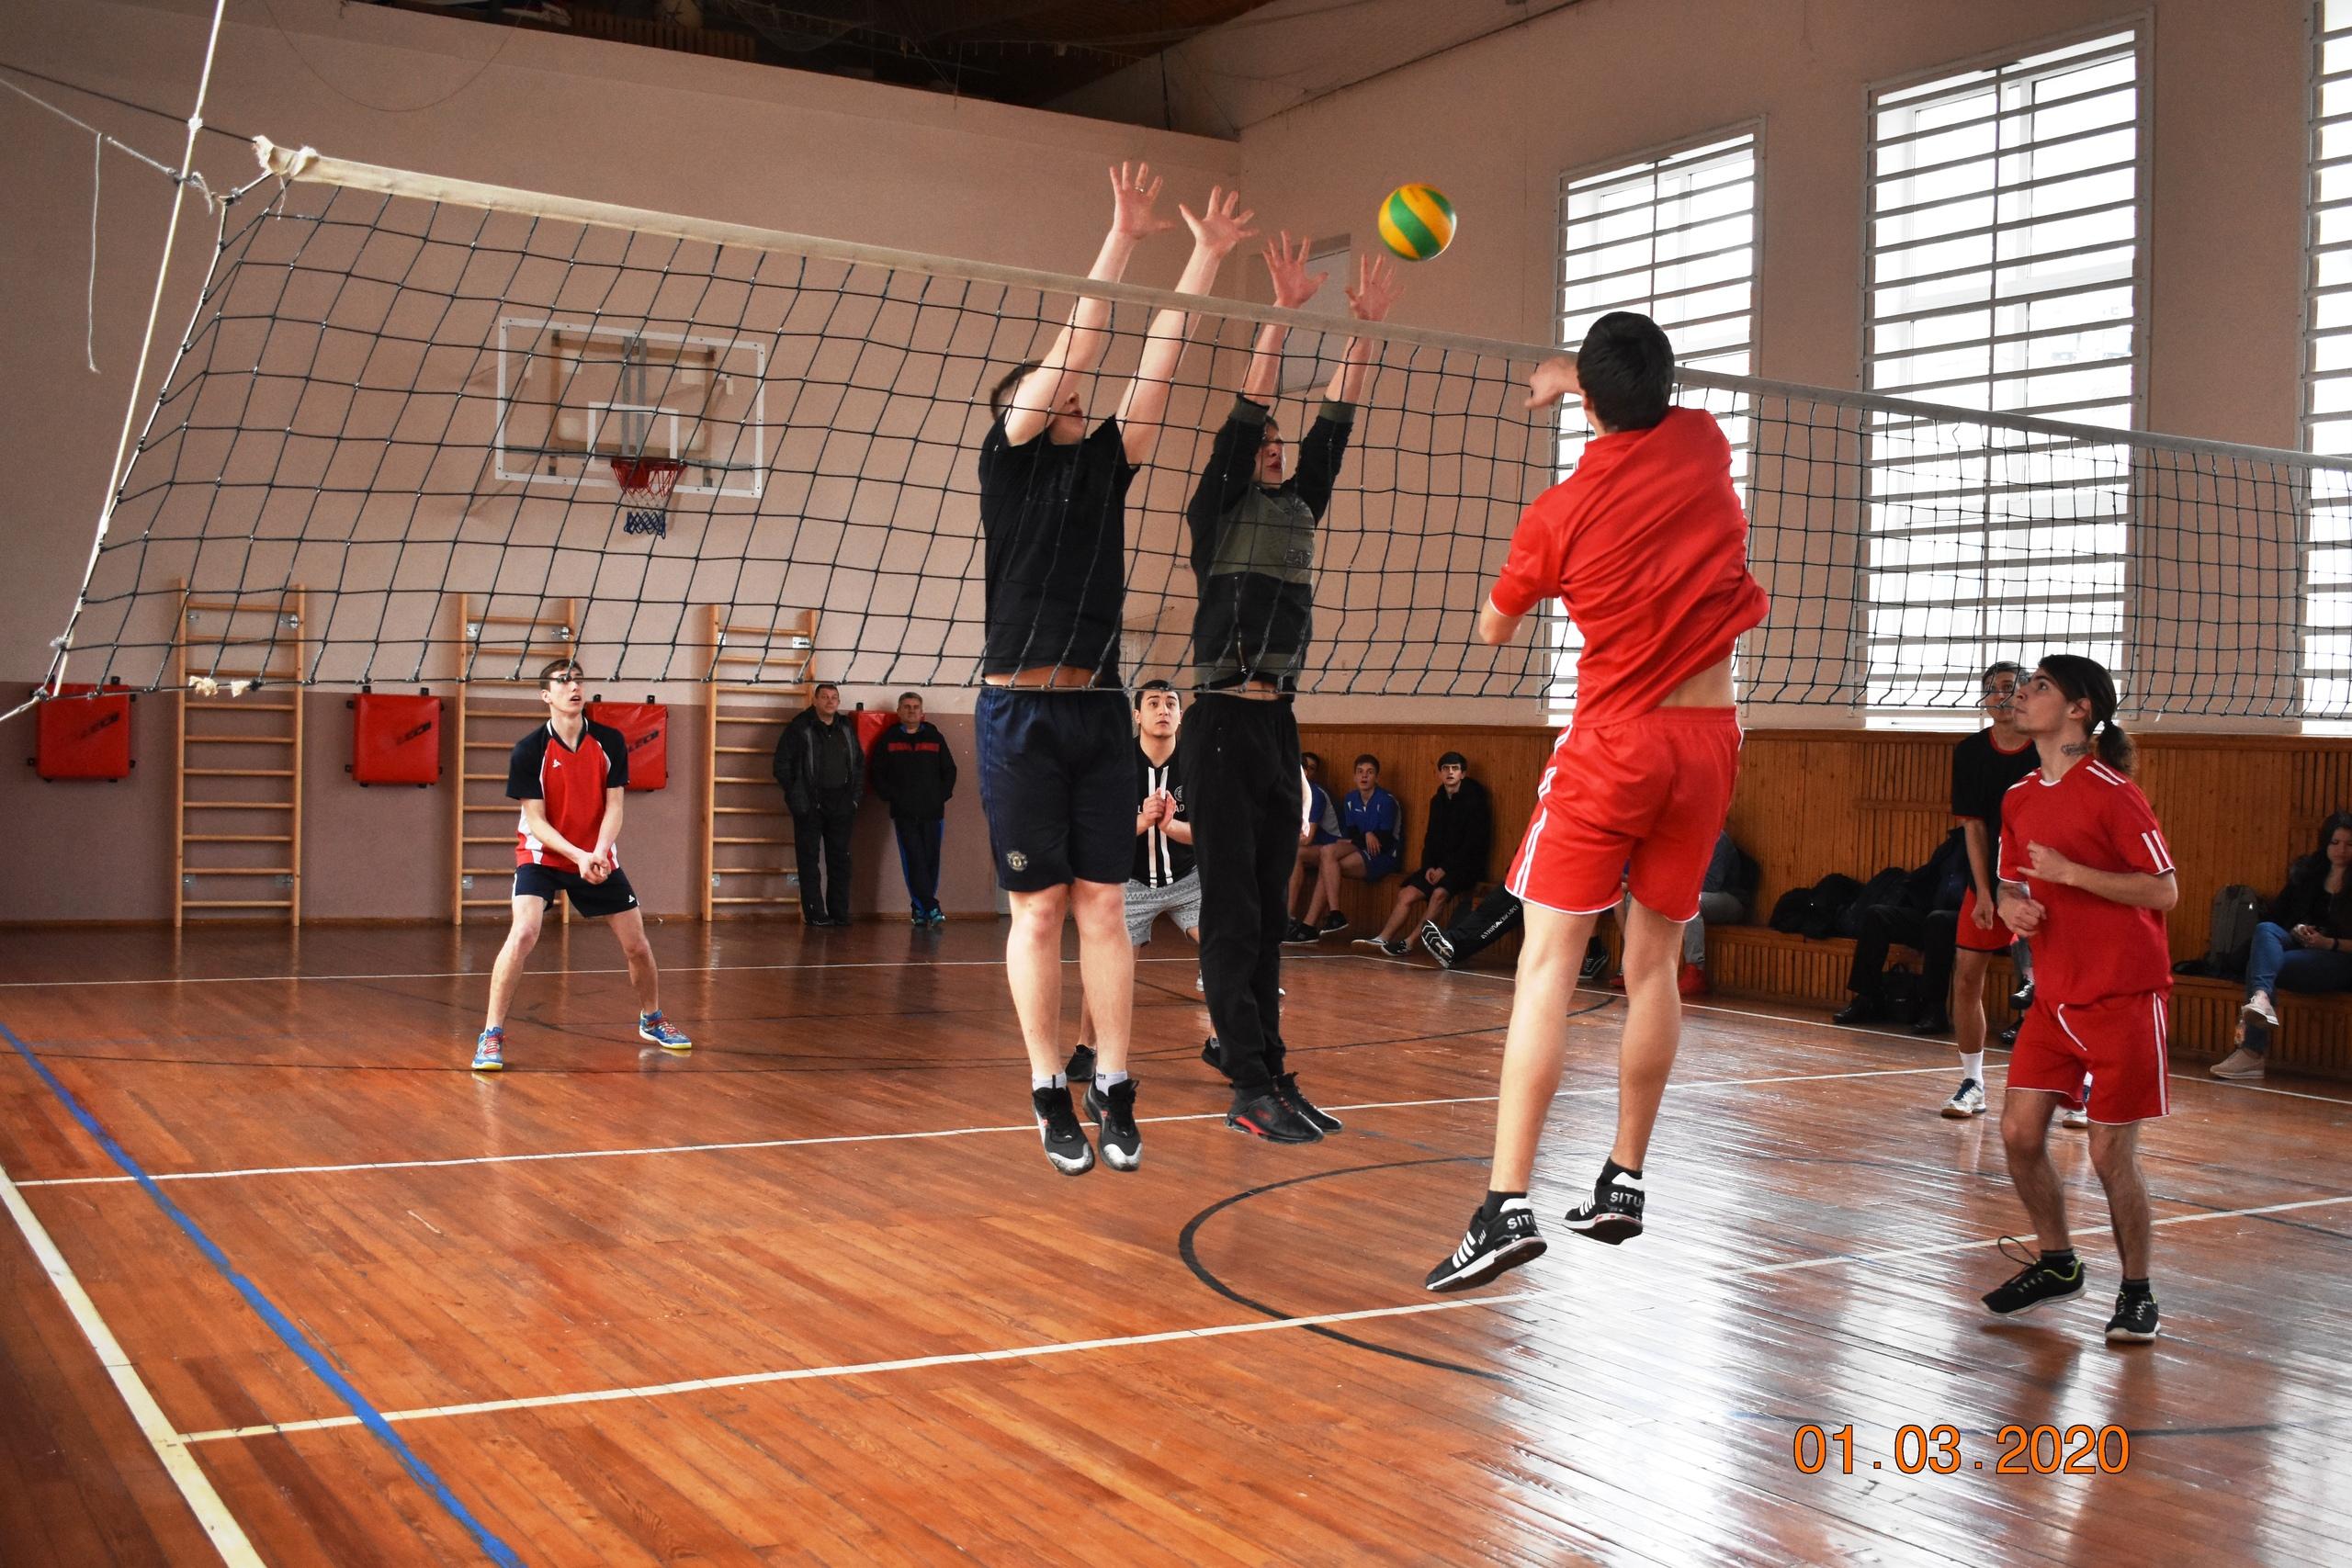 В Туапсе проходит Чемпионат по волейболу